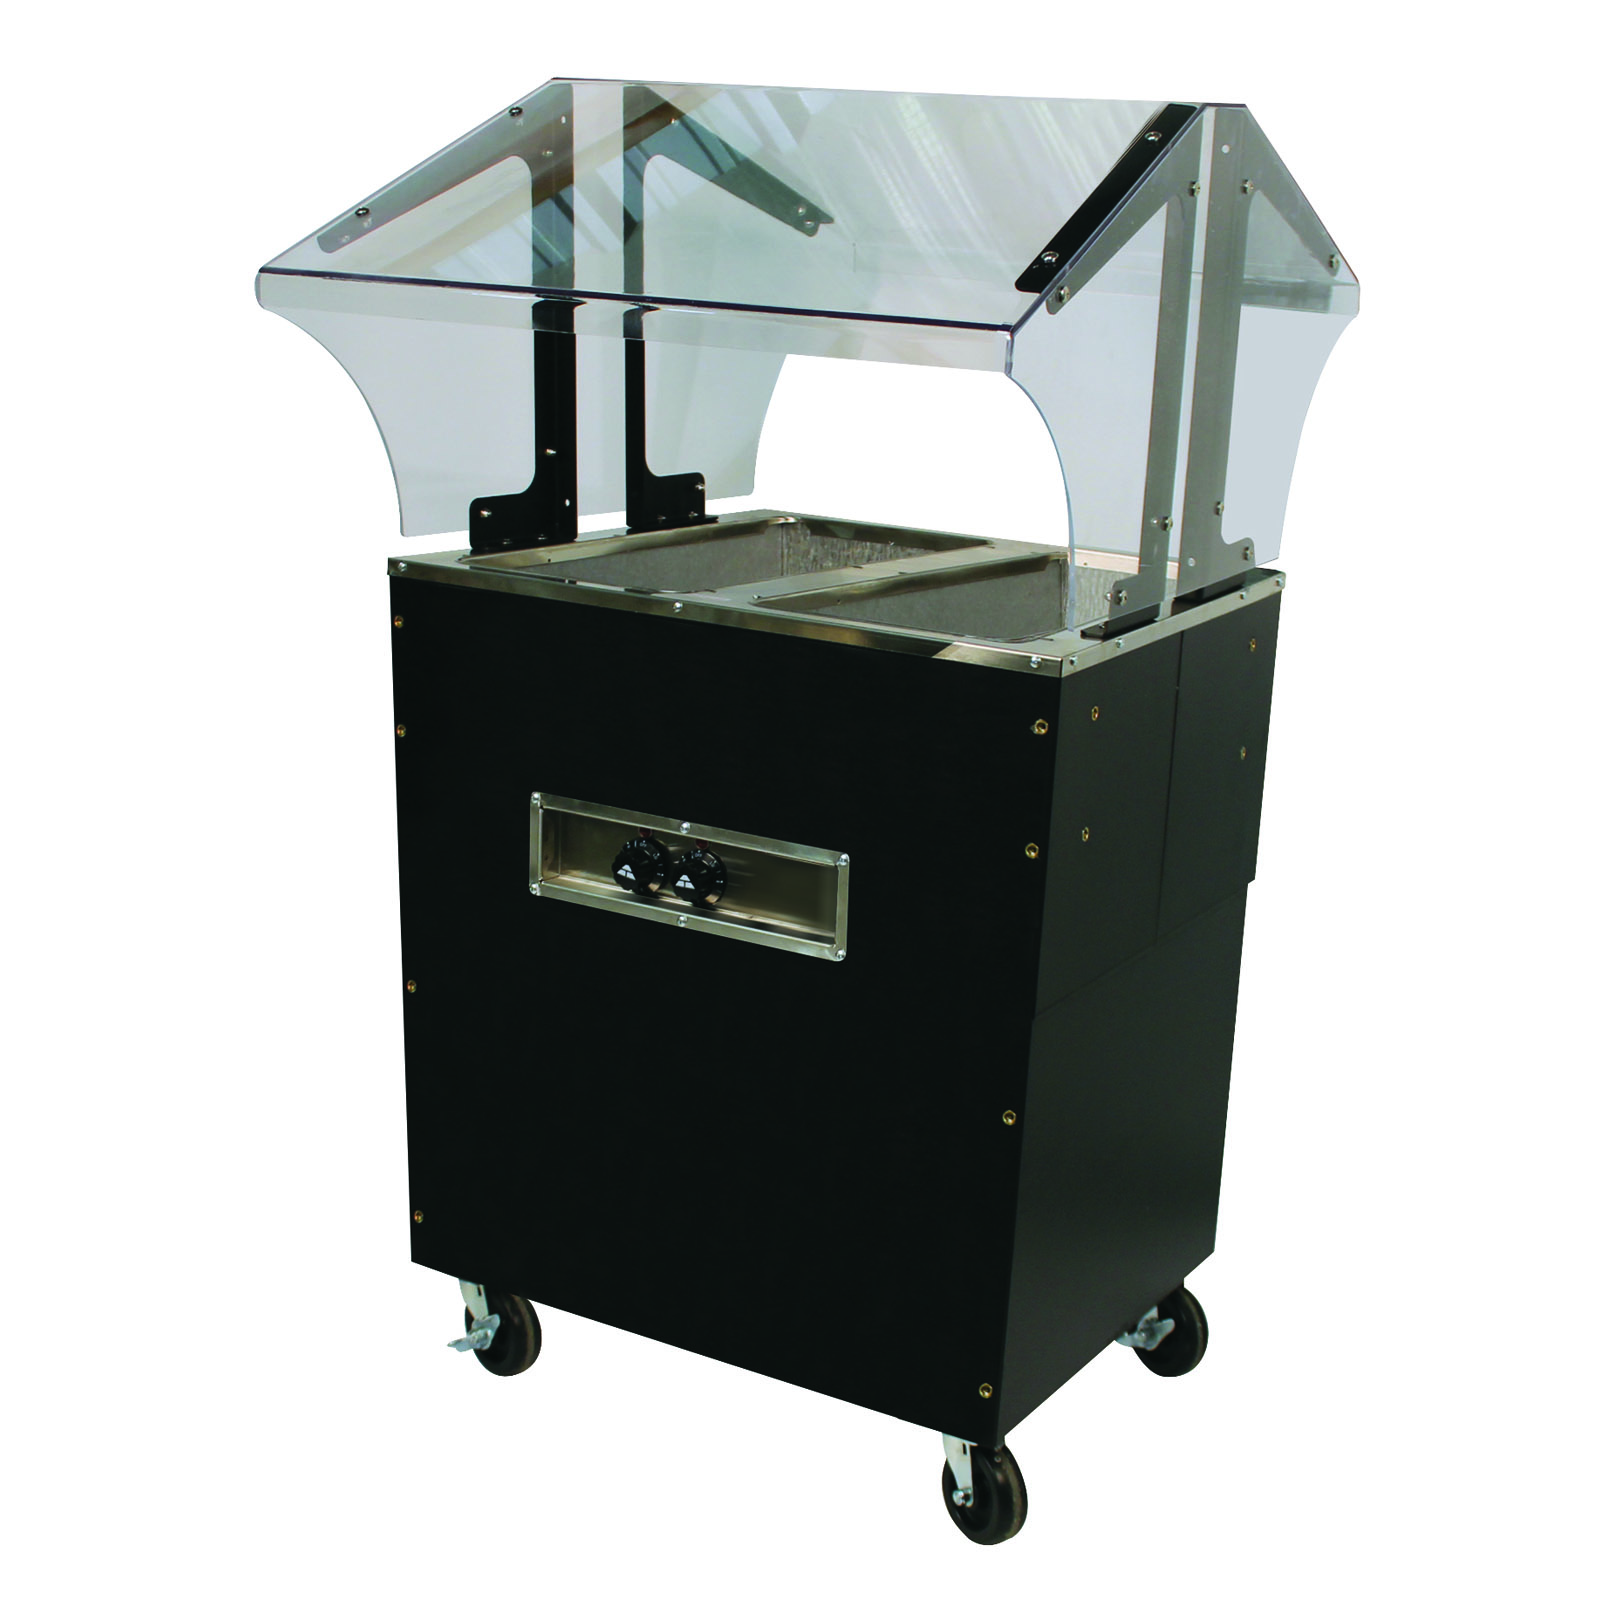 Advance Tabco B2-120-B-S-SB serving counter, hot food, electric